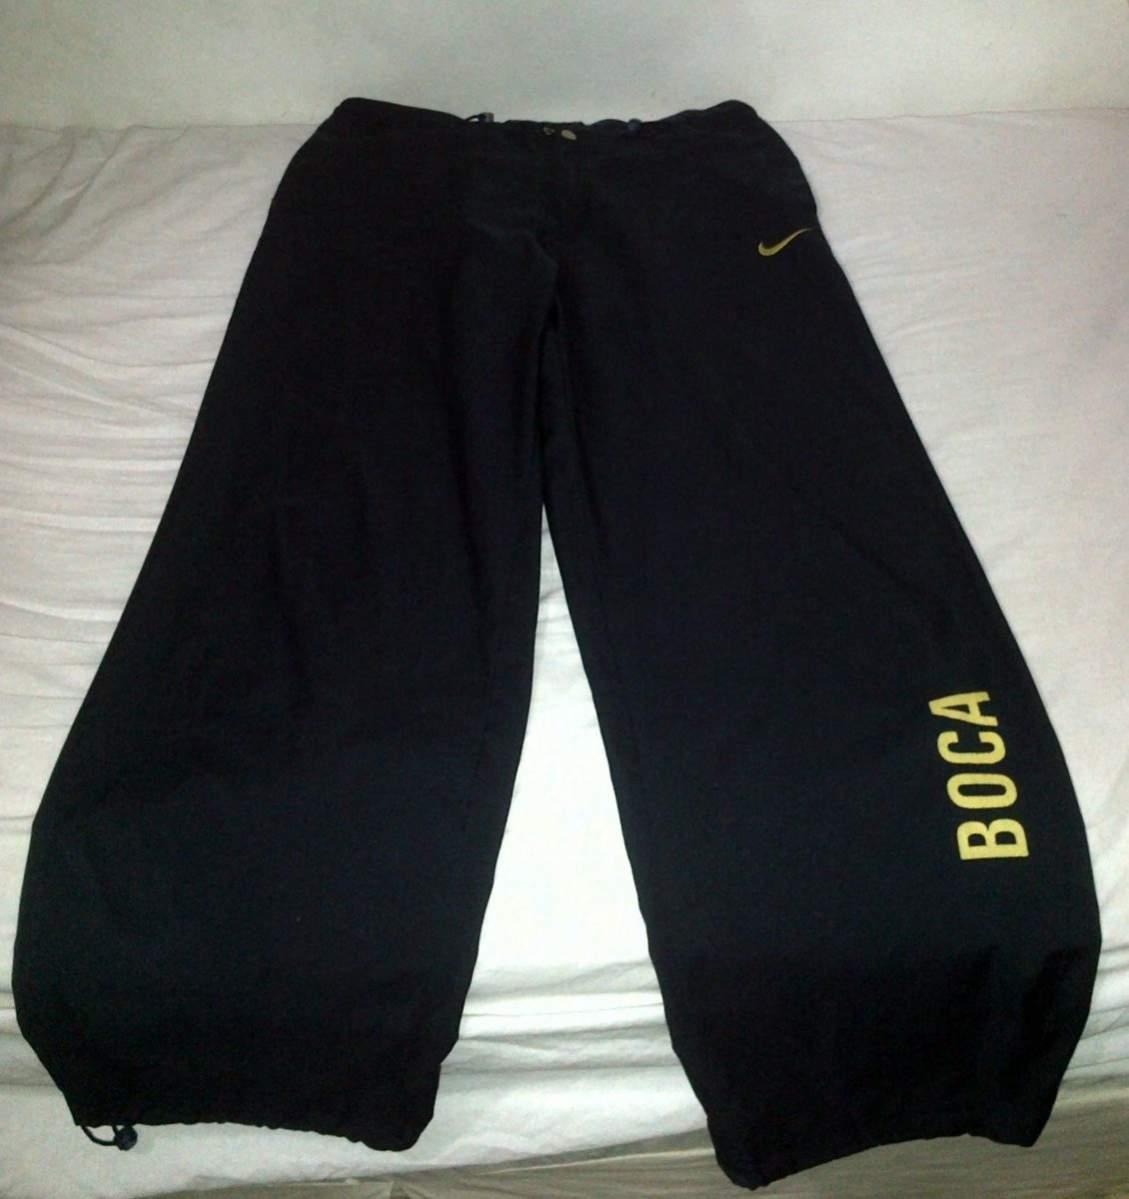 pantalon-largo-boca-nike-original-2005_MLA-F-3935688391_032013.jpg